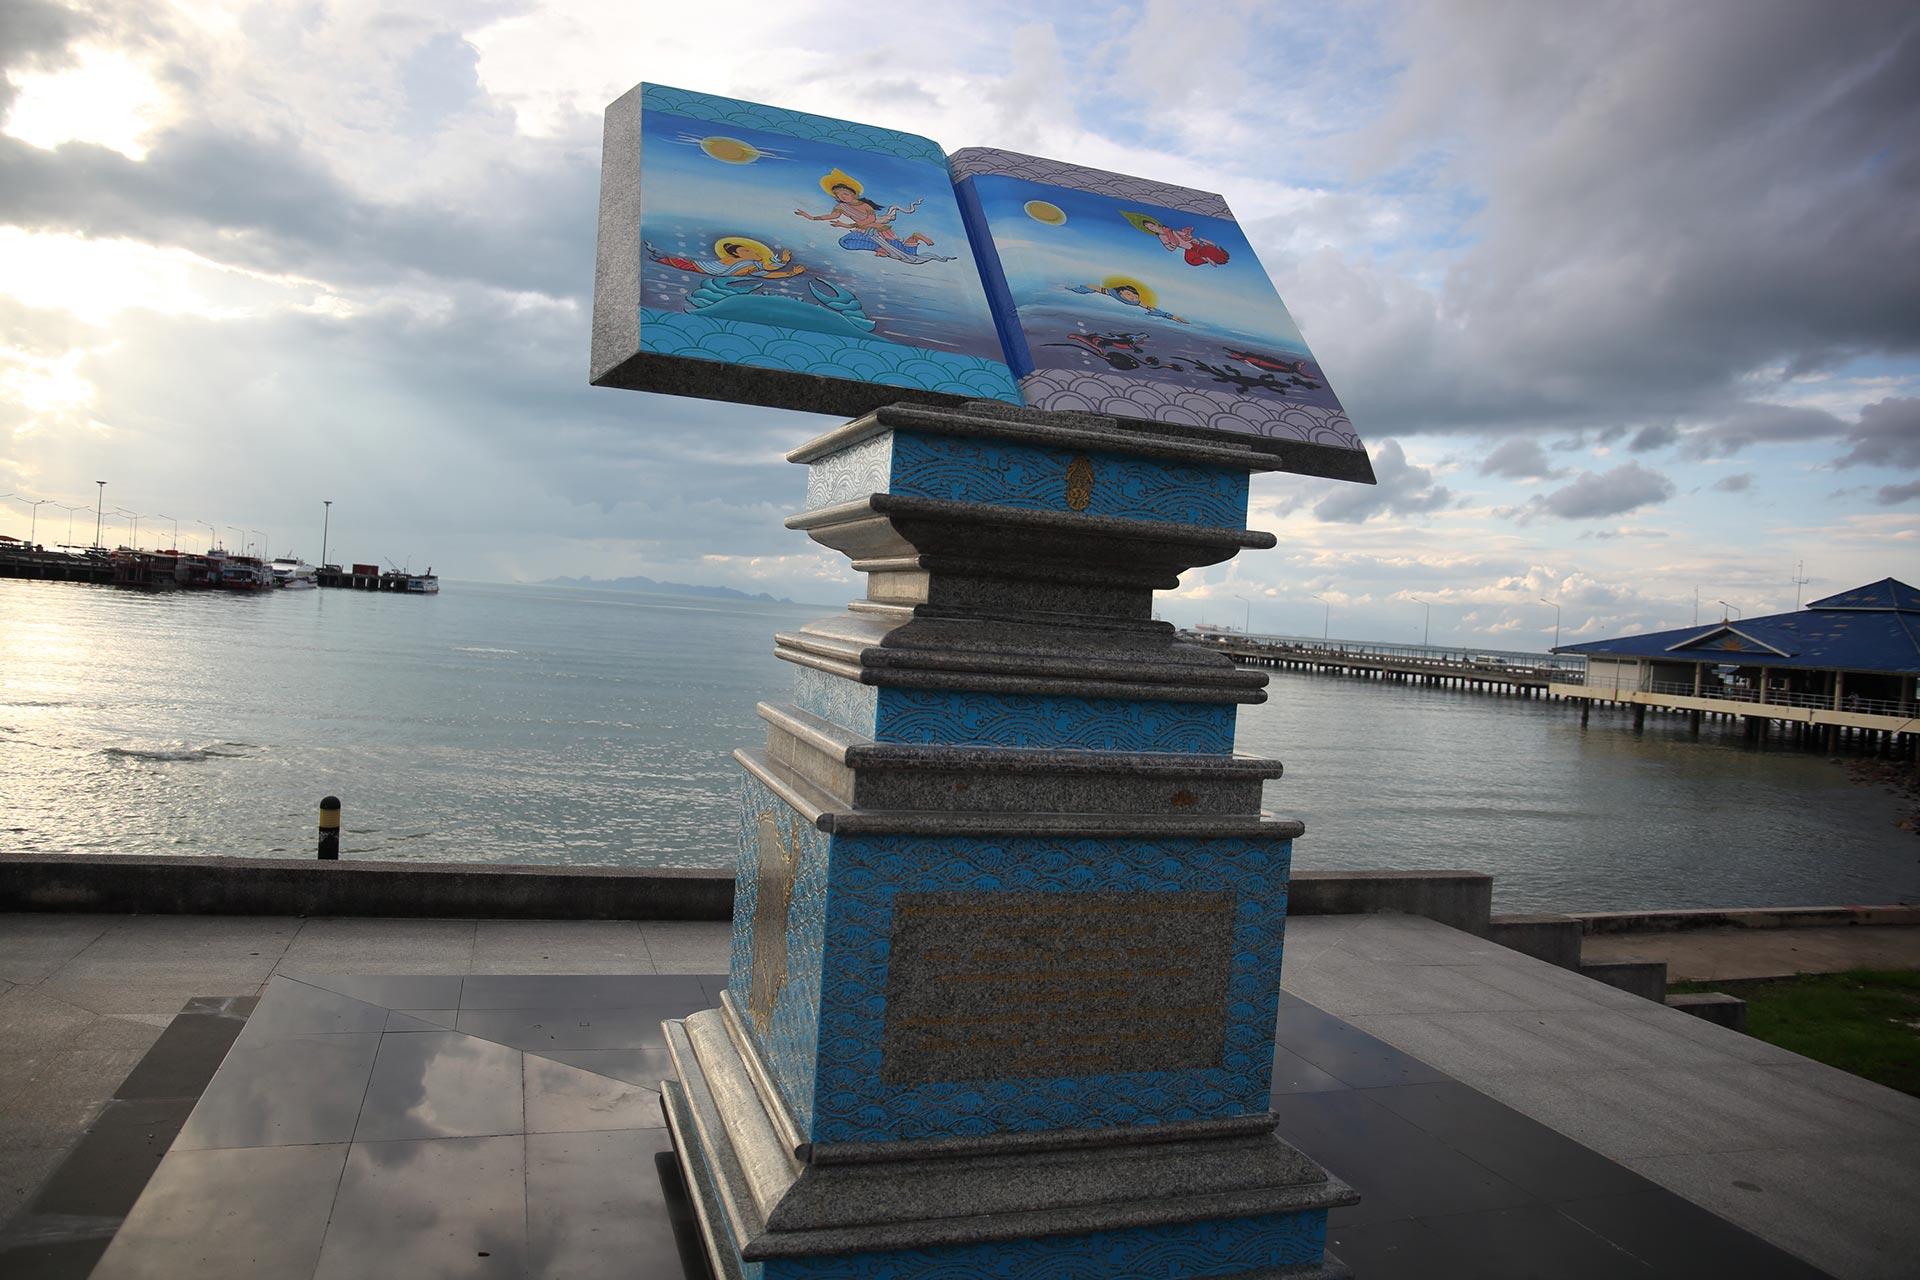 visarun visa визаран book Naton pier Samui